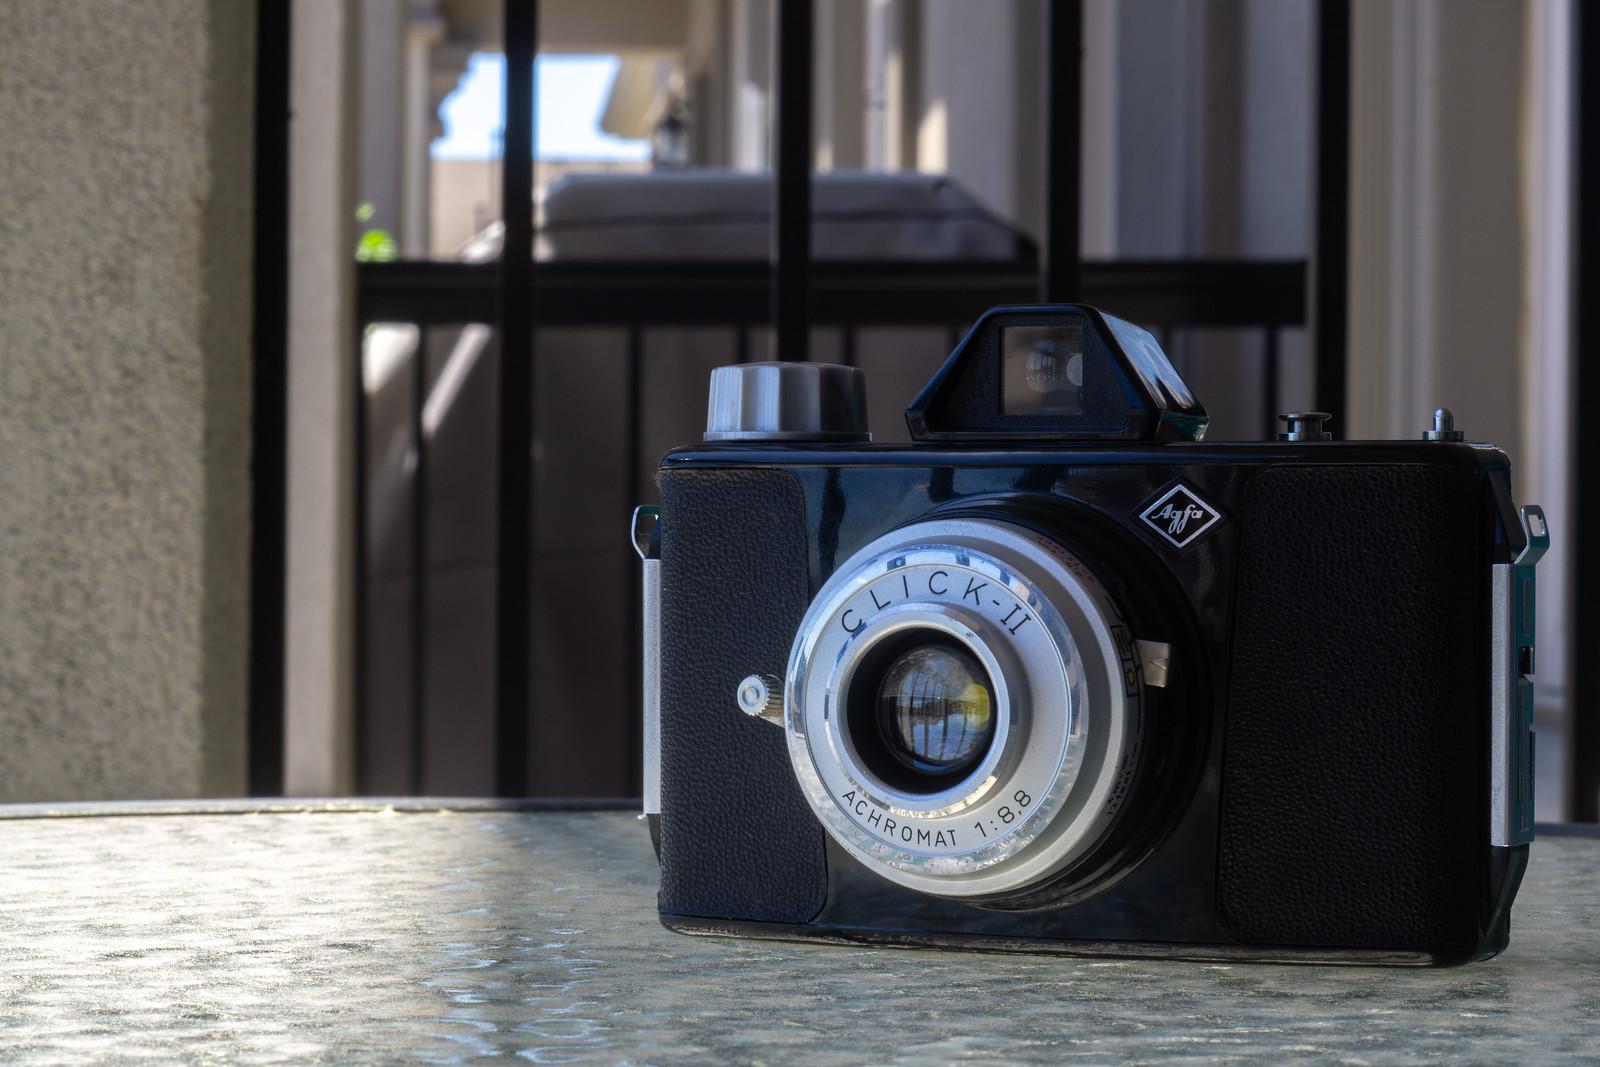 Camera Review Blog No. 125 - Agfa Click-II